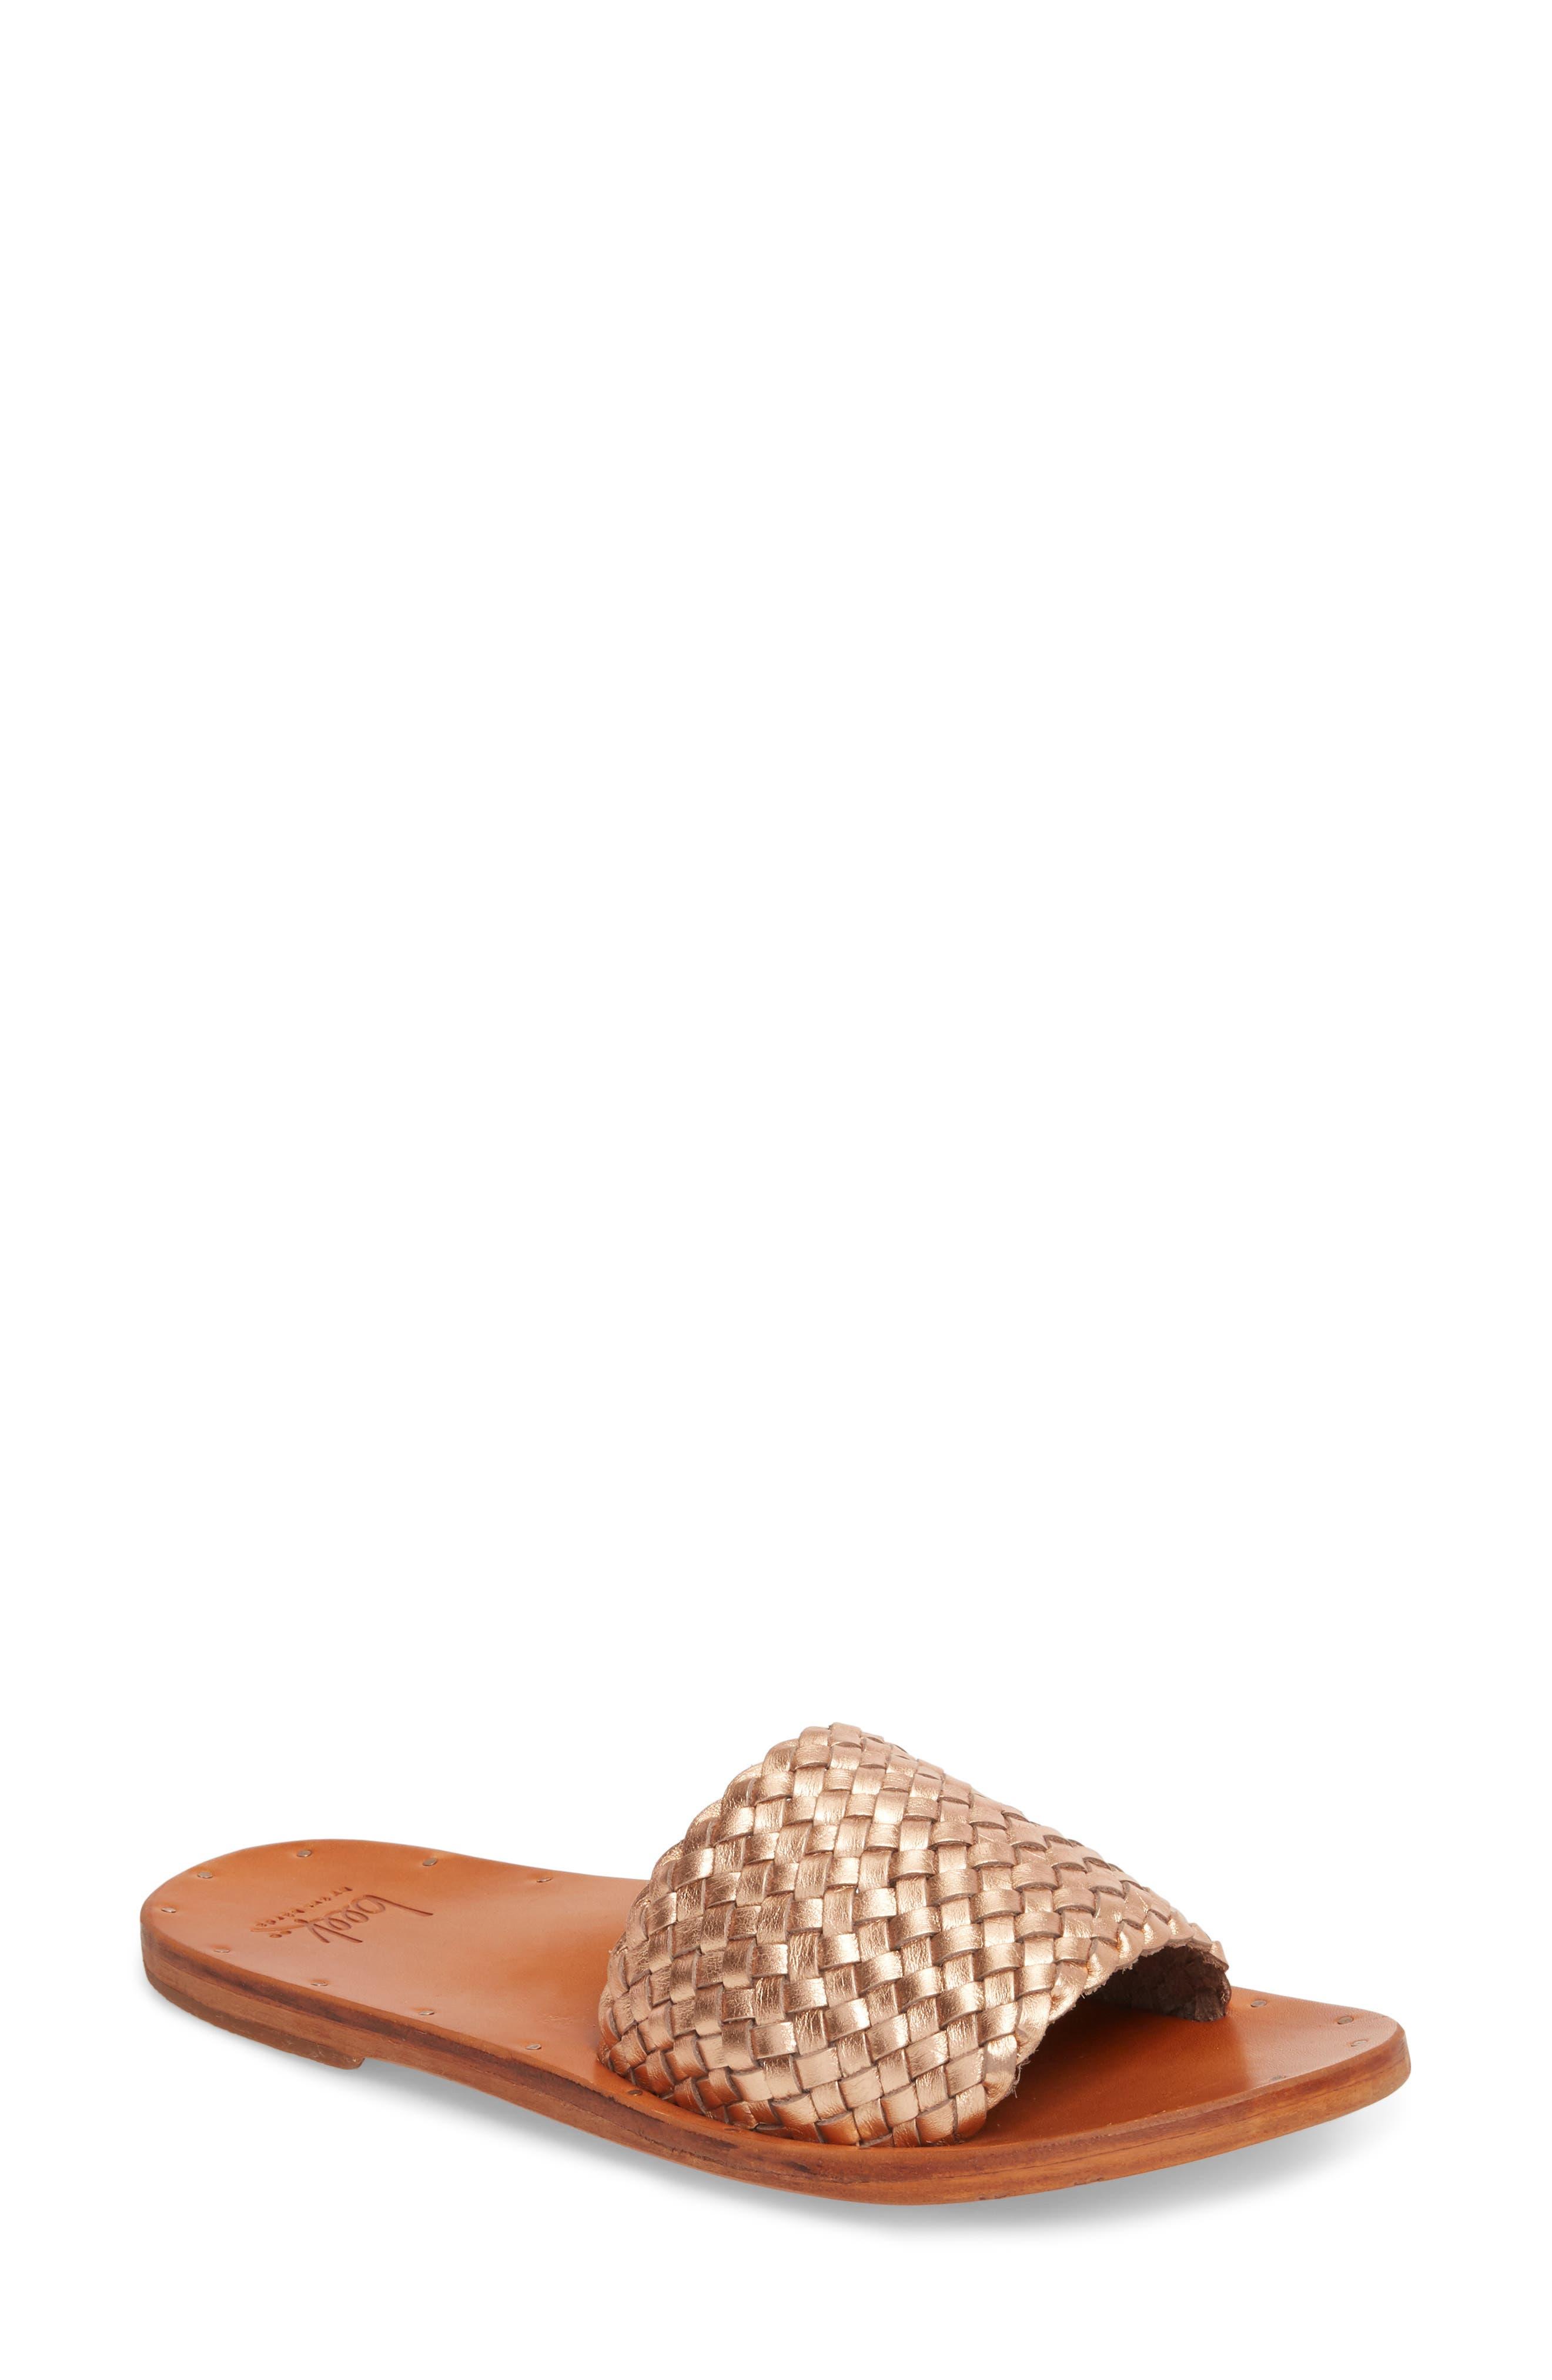 Beek Osprey Woven Slide Sandal (Women)